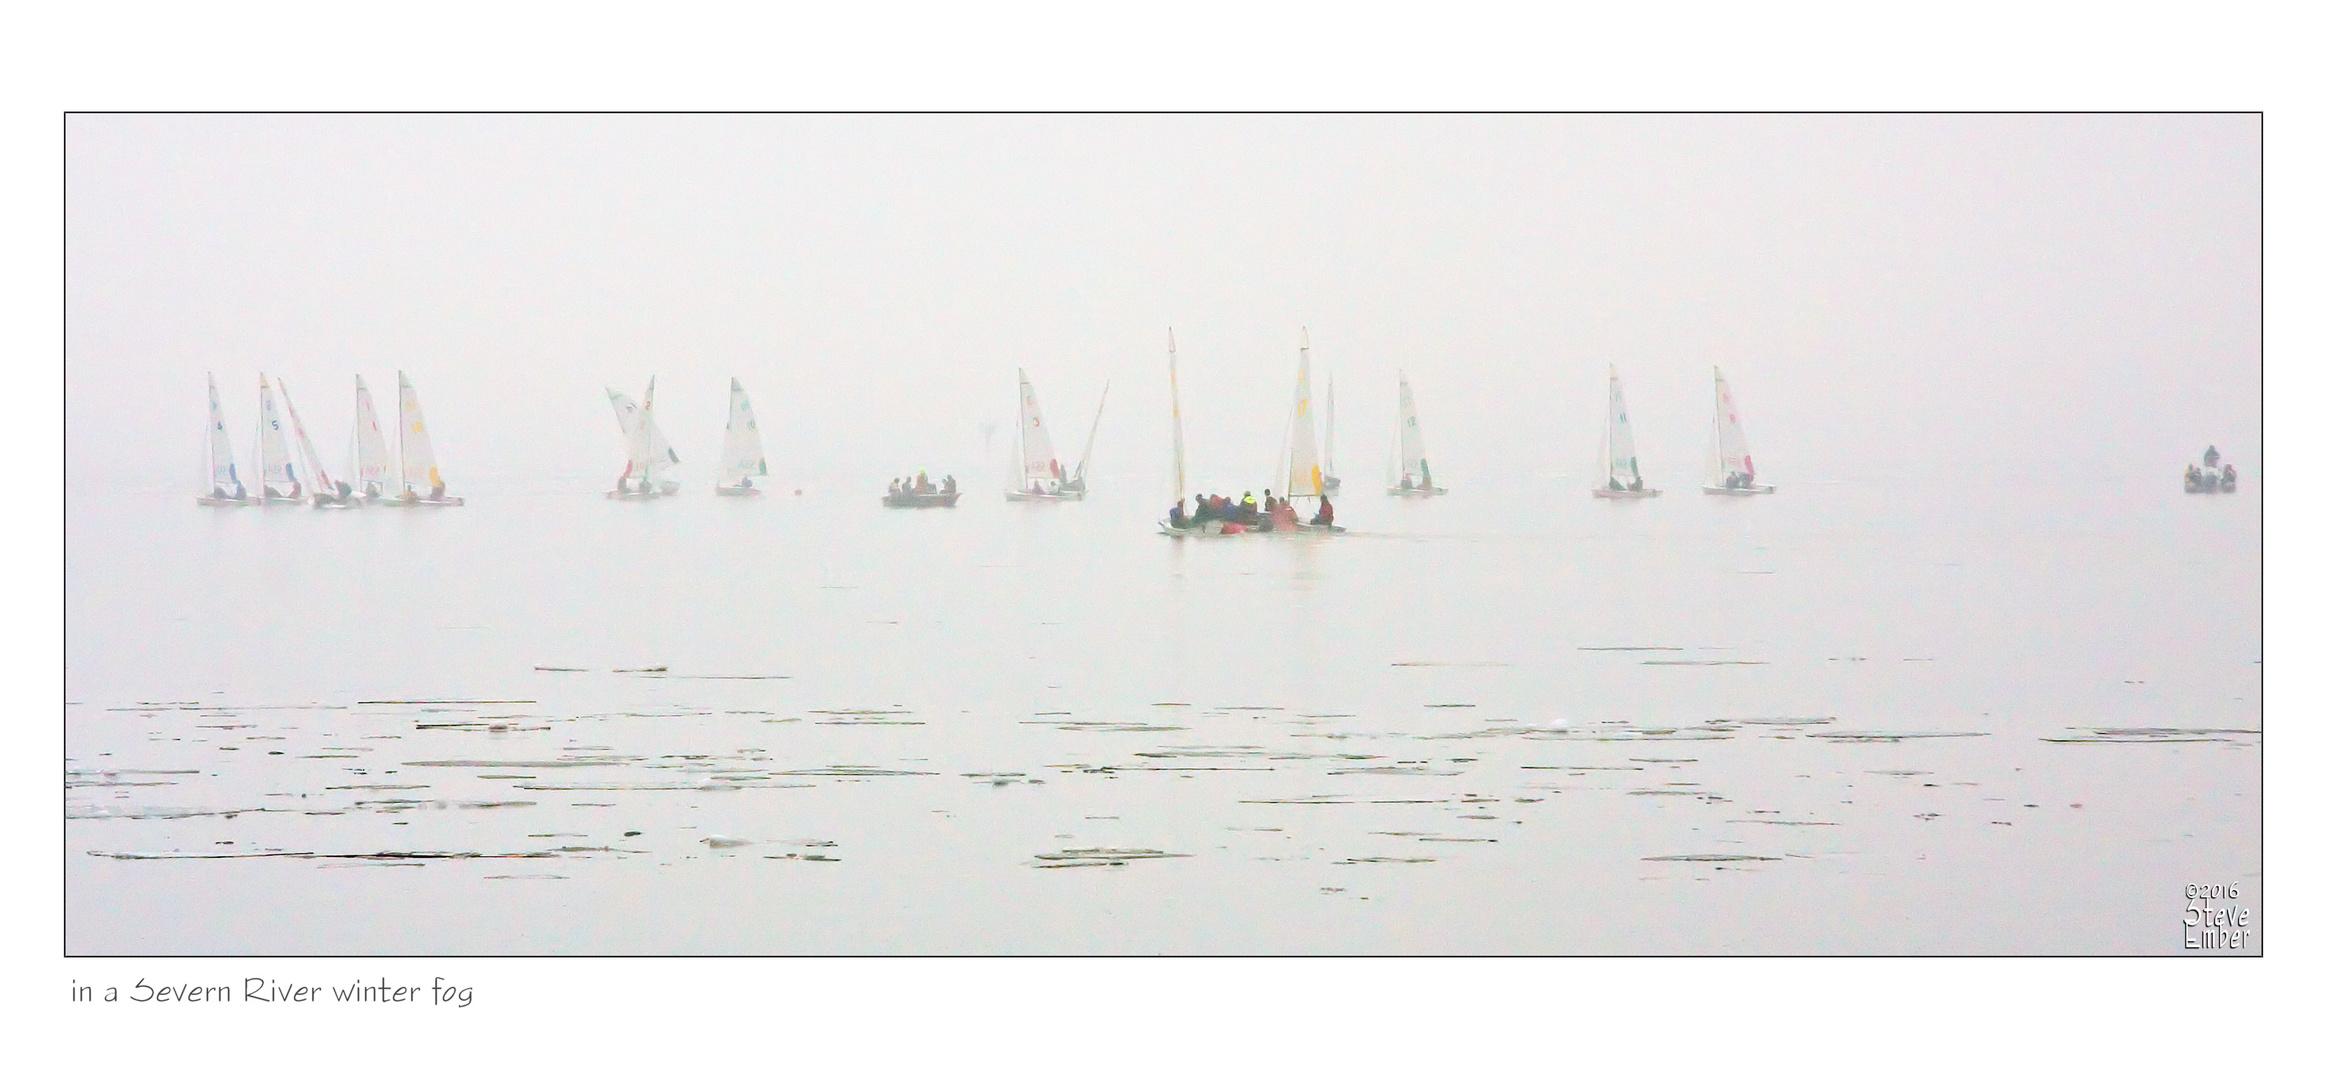 in a Severn River winter fog